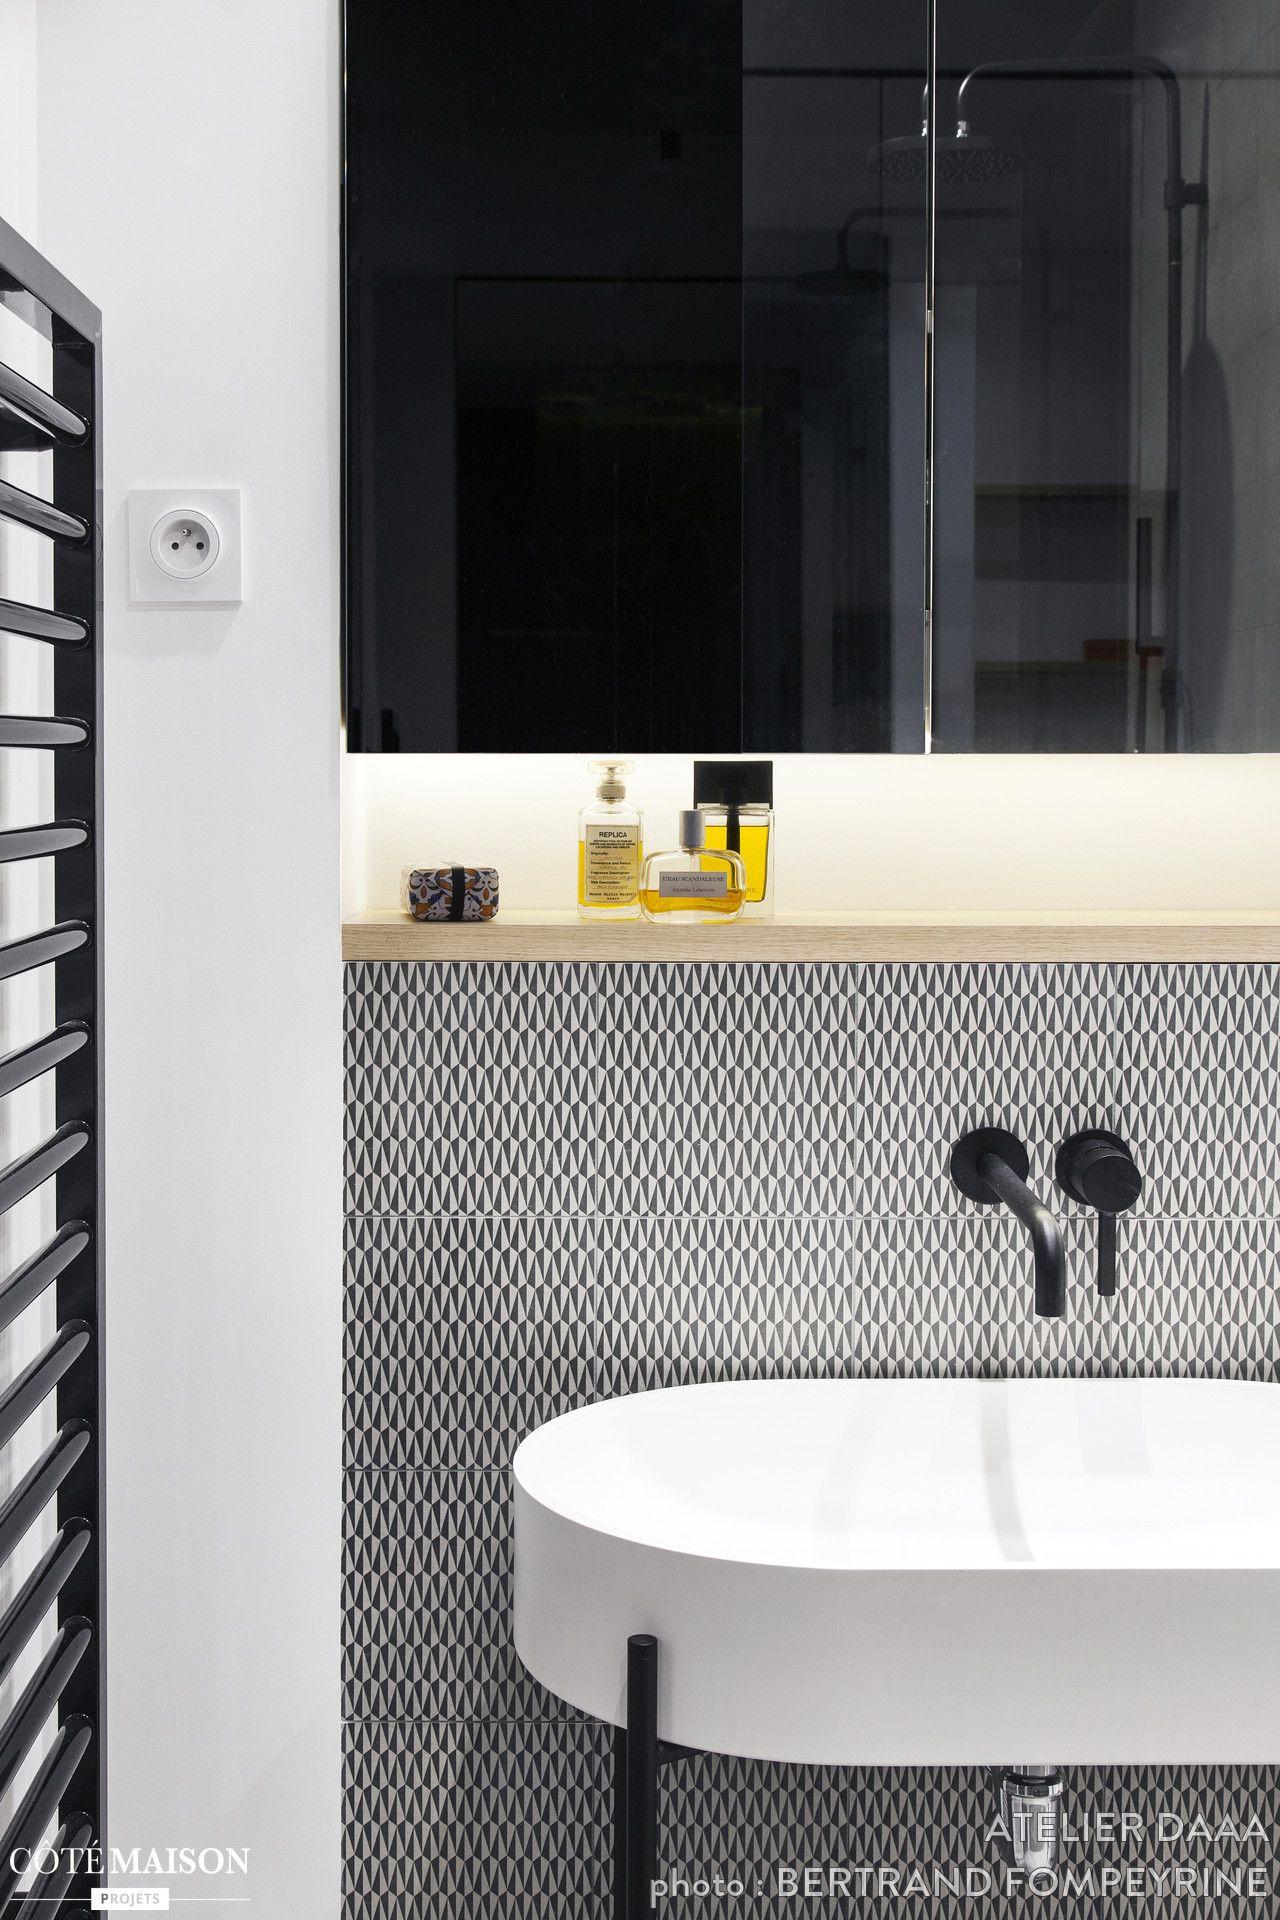 Atelier Daaa Salle De Bain Design Salle De Bains Moderne Et Salle De Bain Noir Et Blanc